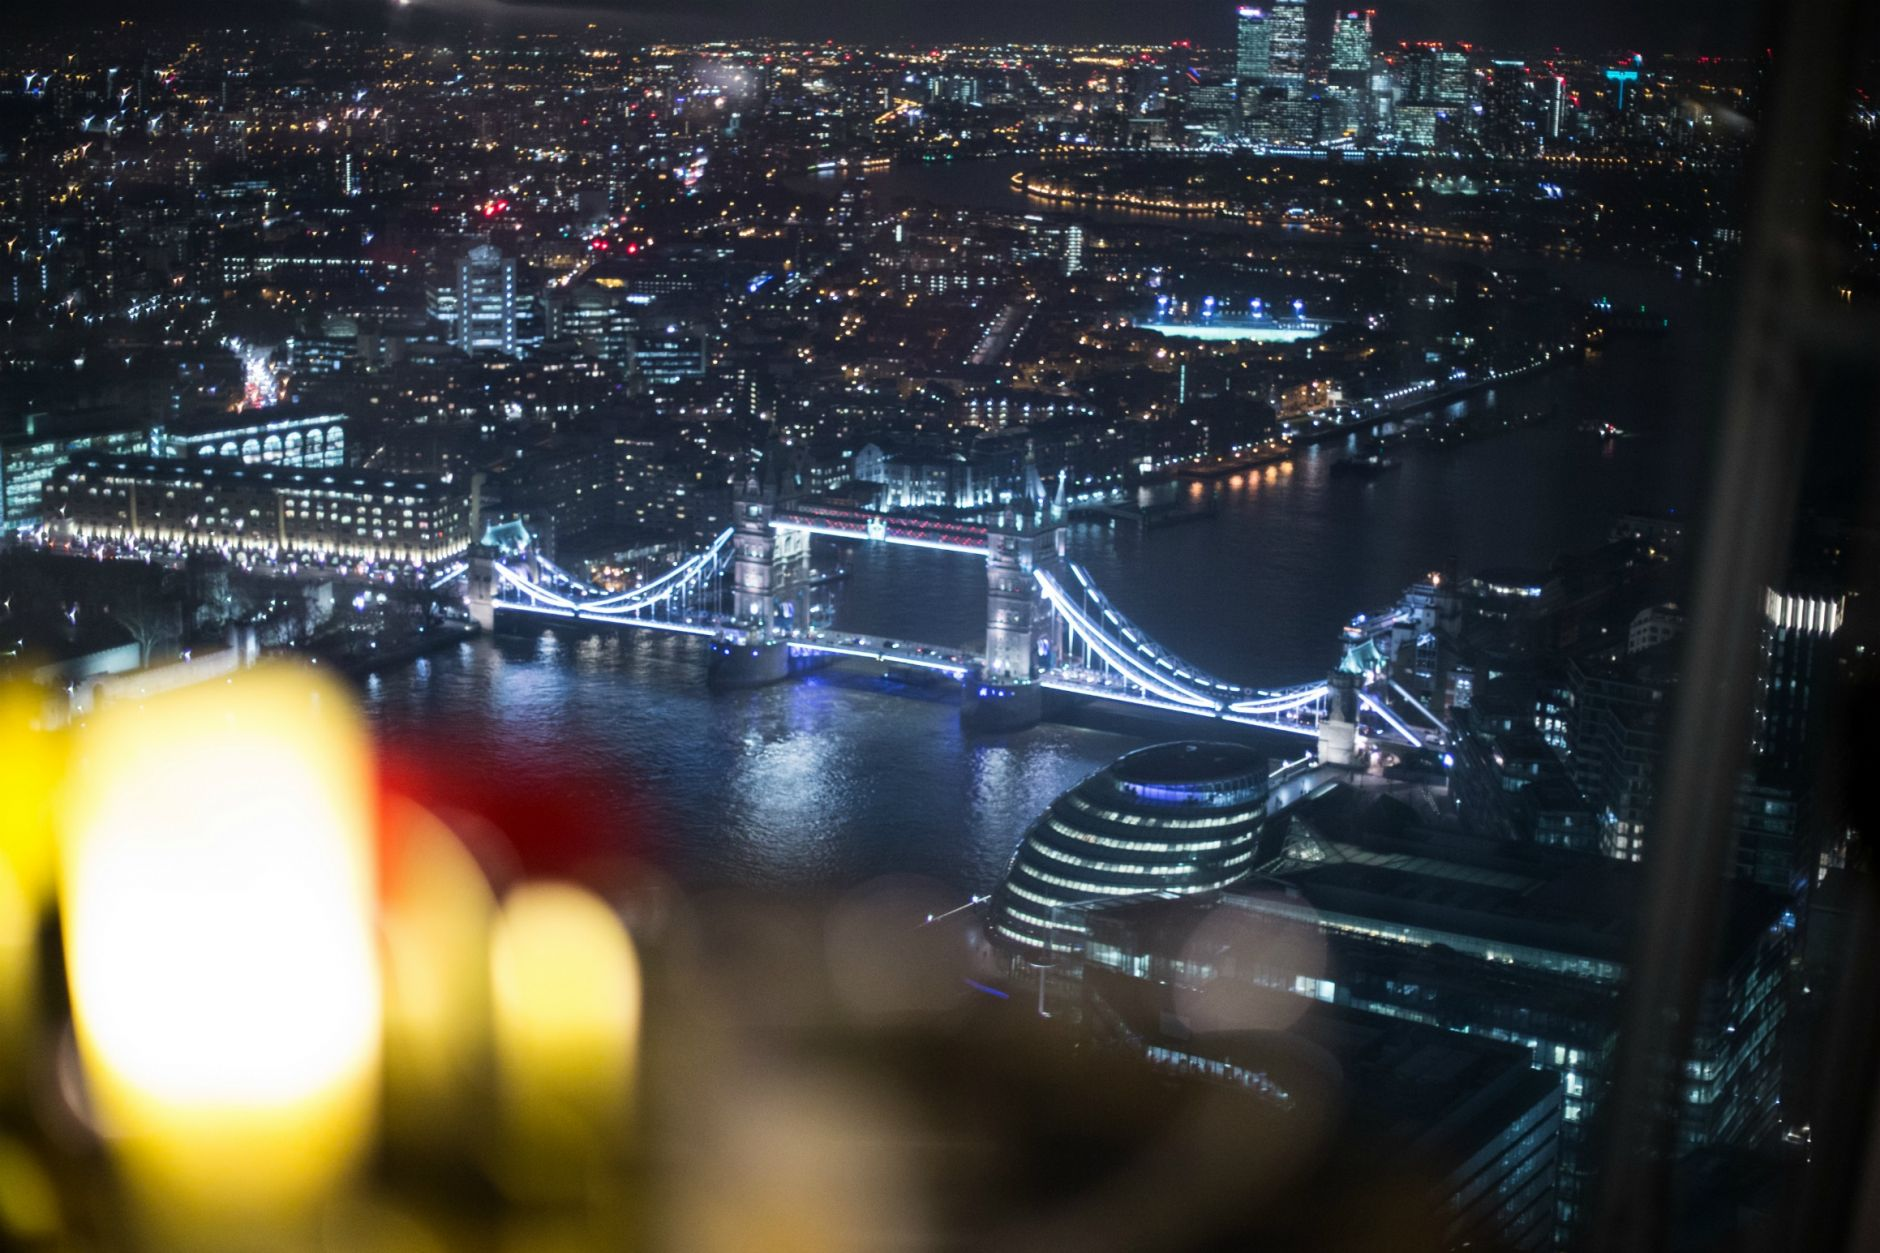 disi-couture-travel-shangri-la-hotel-shard-london-tower-bridge-england-edisa-shahini-15